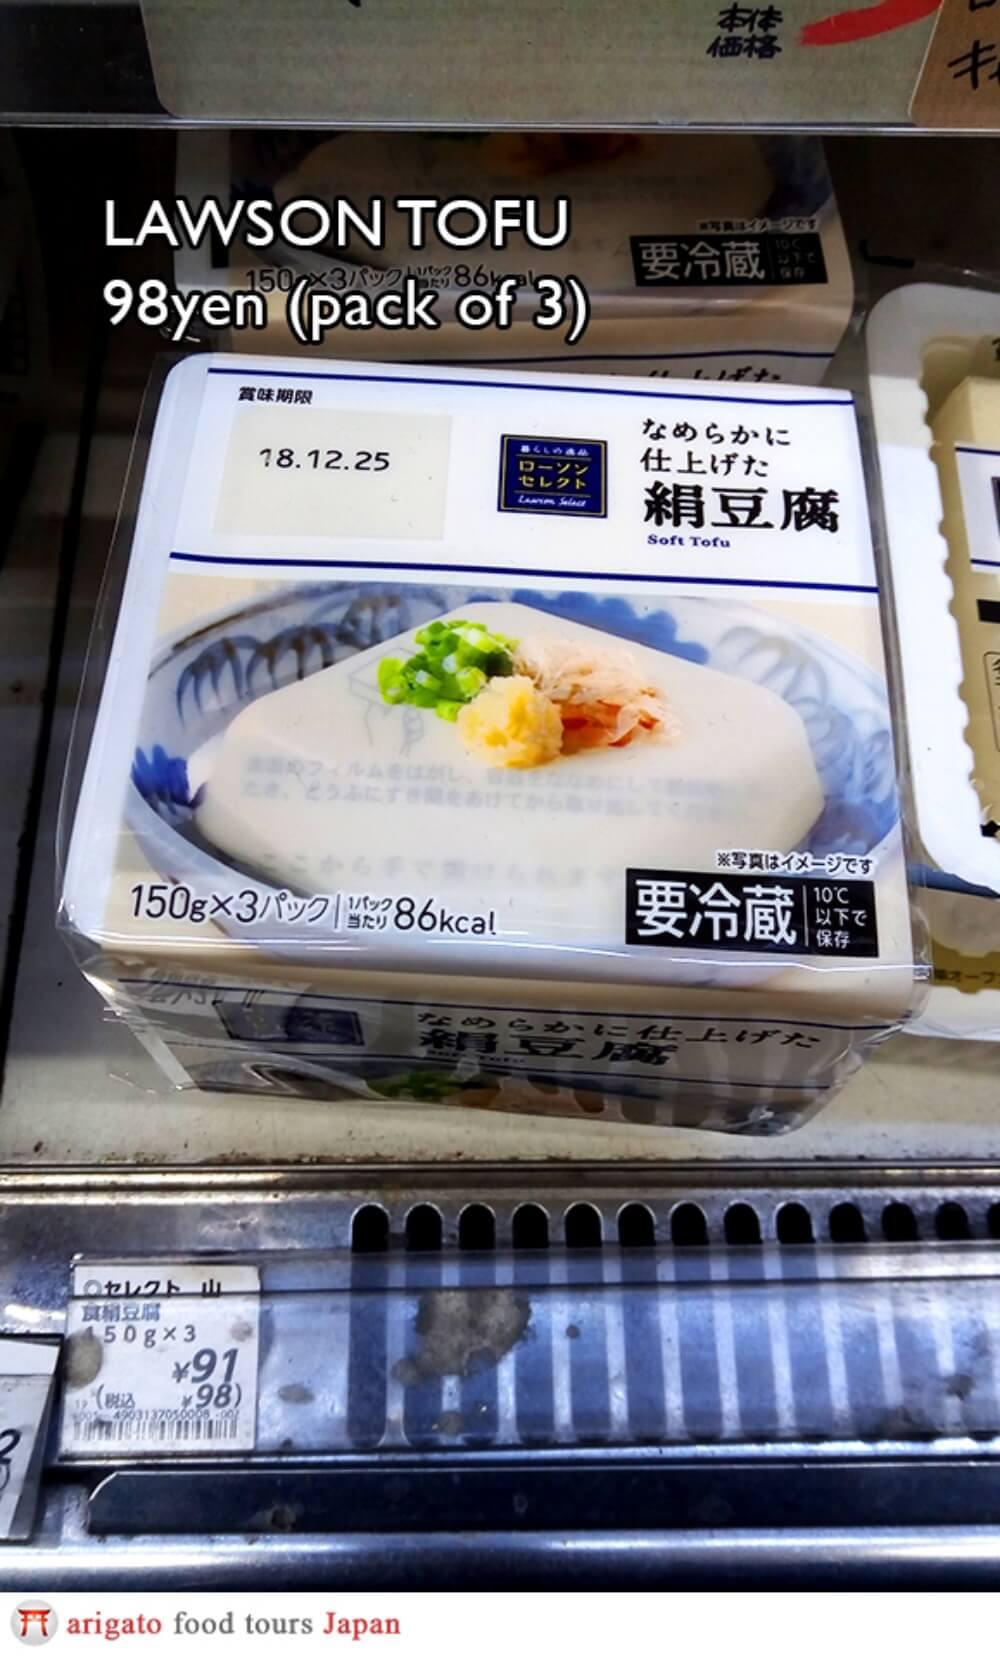 lawson tofu